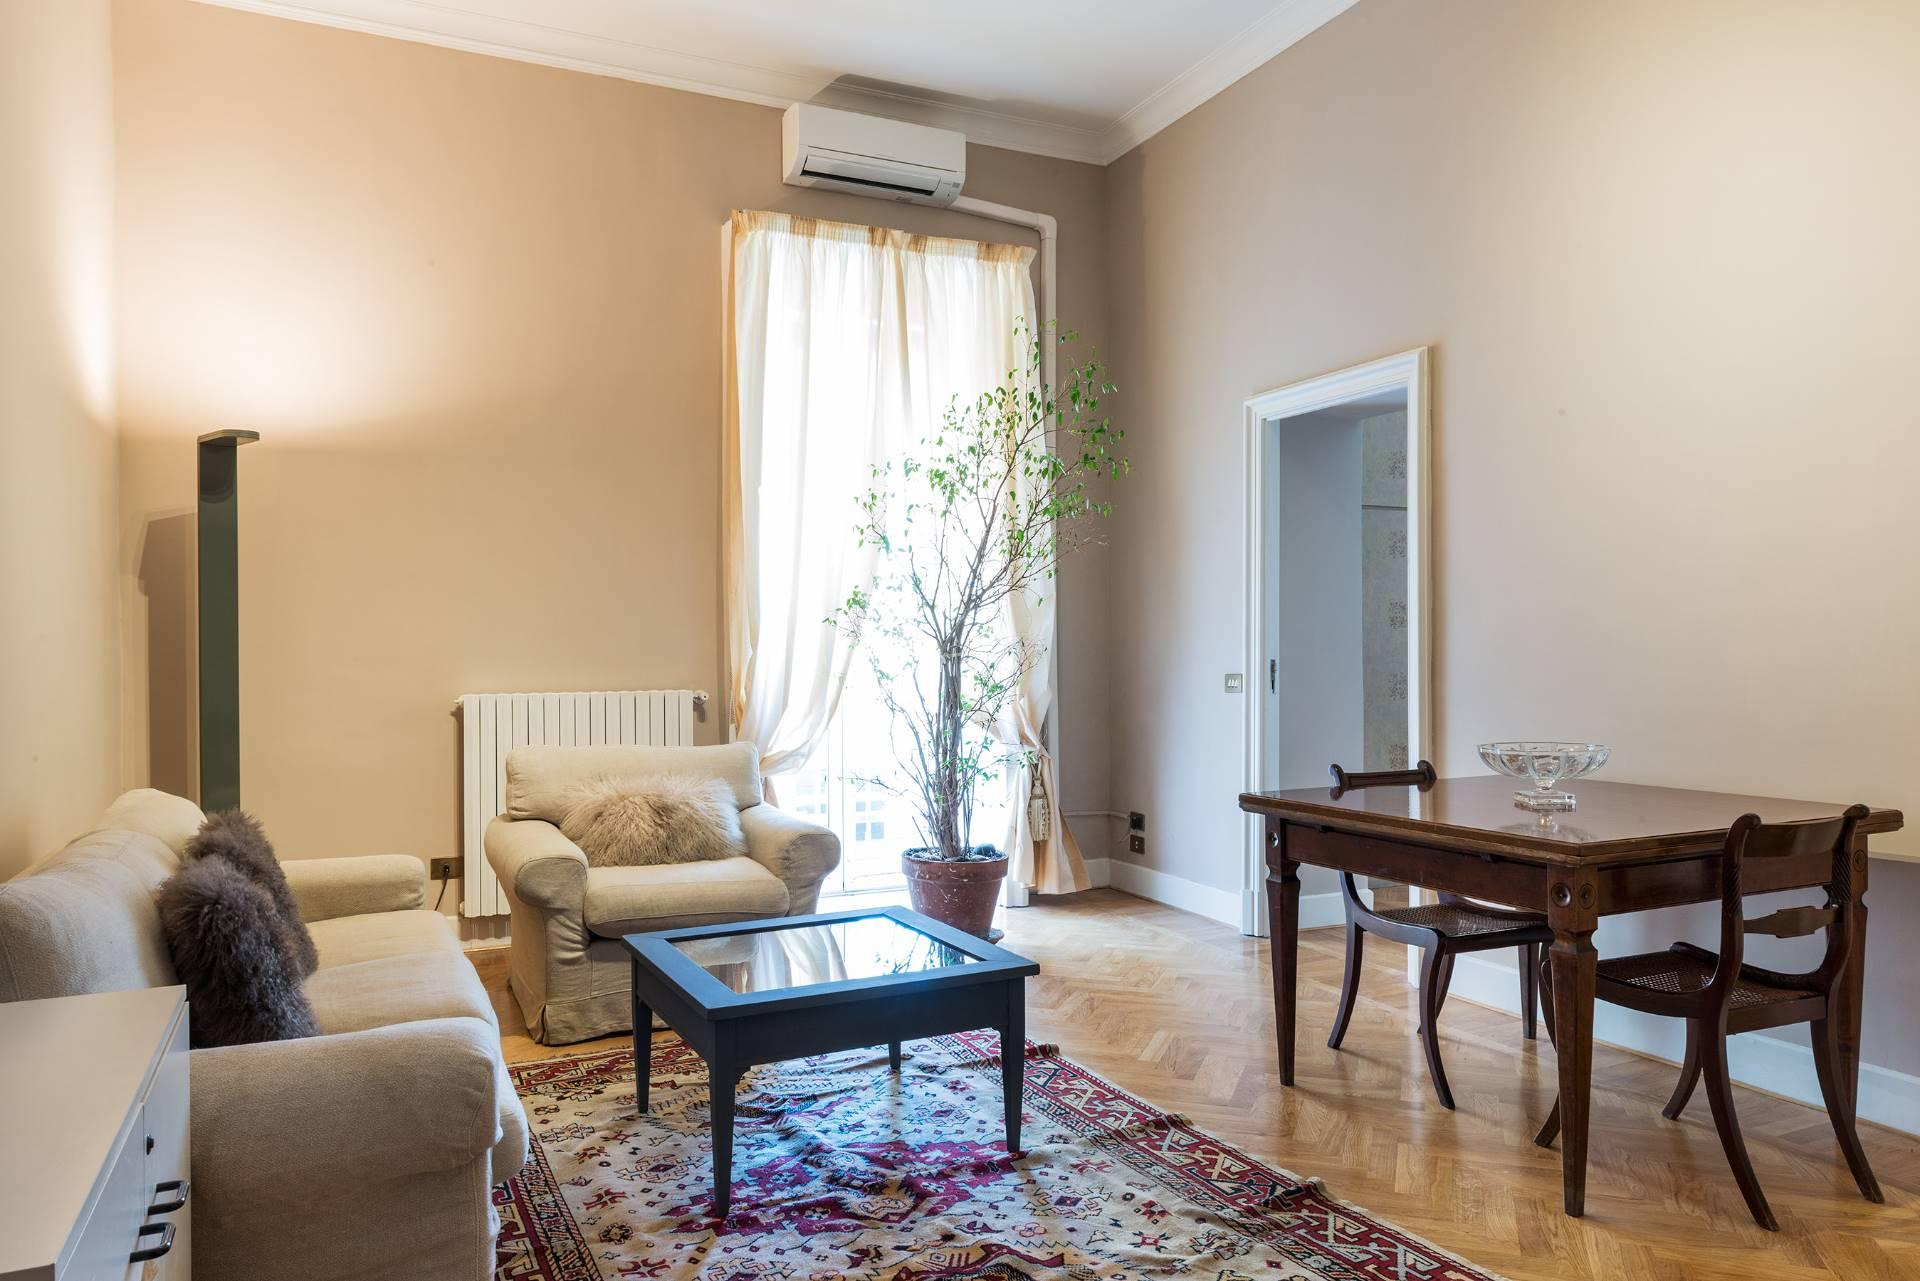 Stylish apartment with seaviews - 16